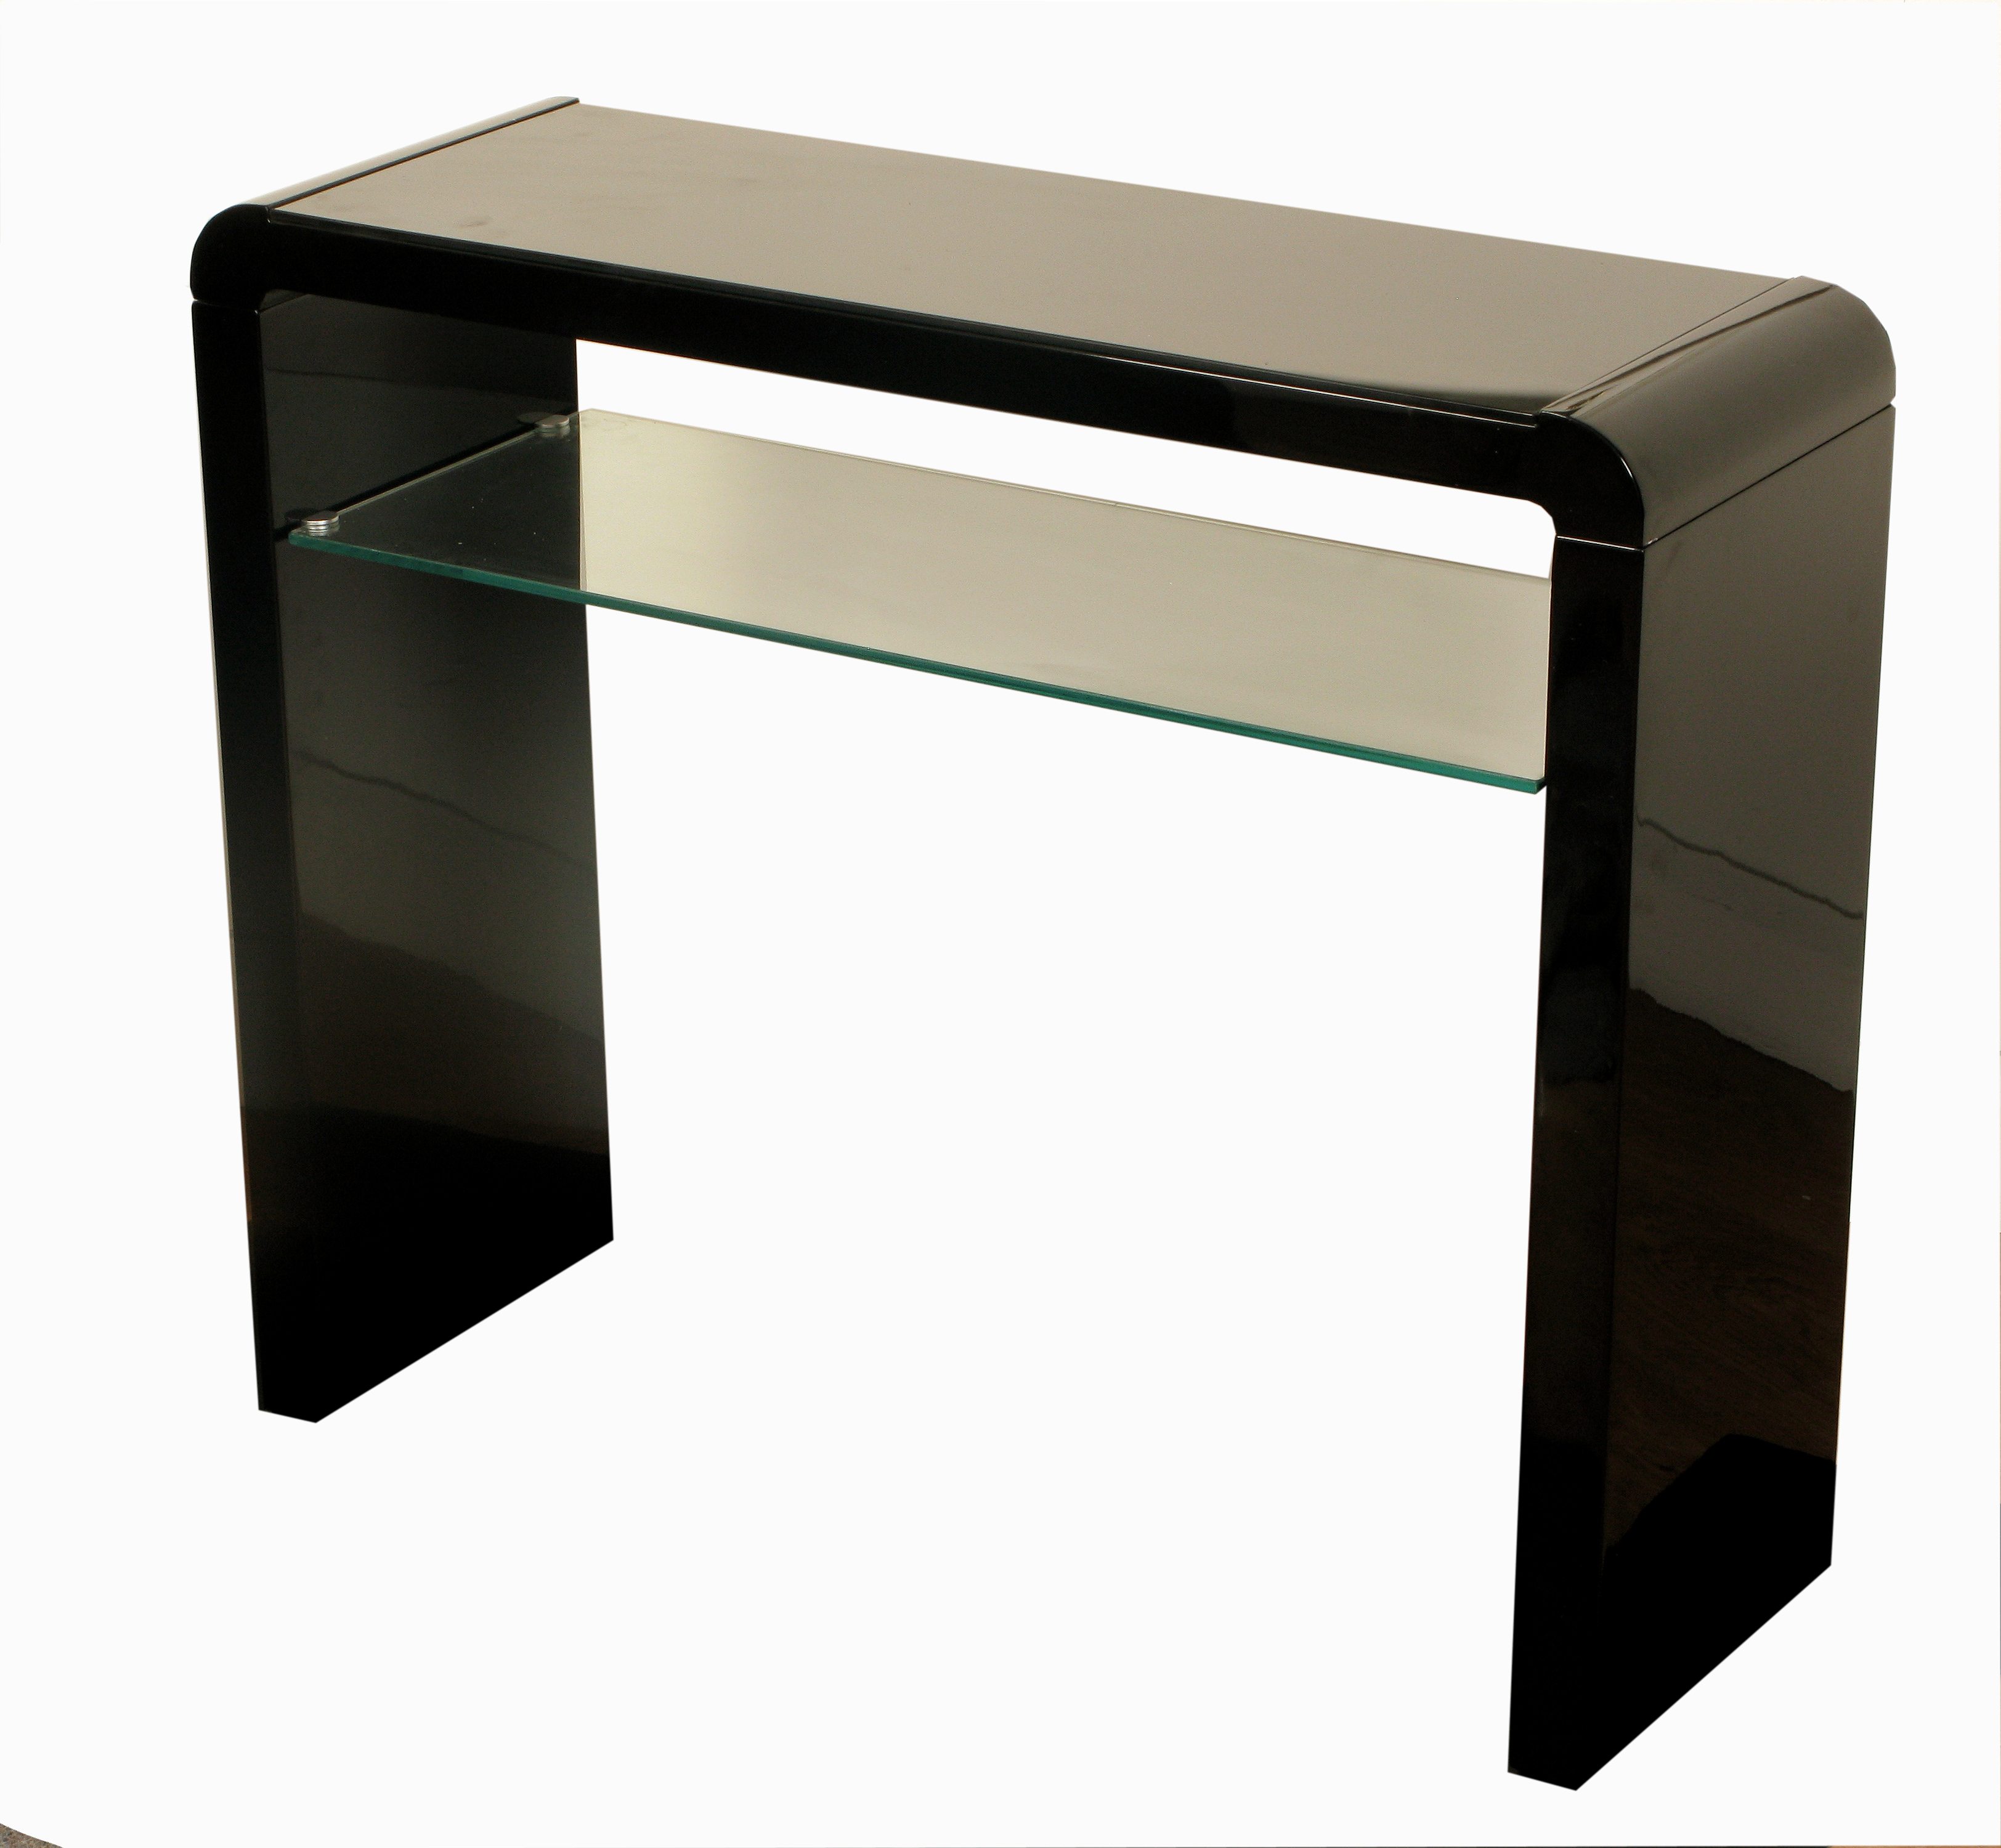 black sofa table. ATLANTIS CLARUS BLACK CONSOLE Black Sofa Table I